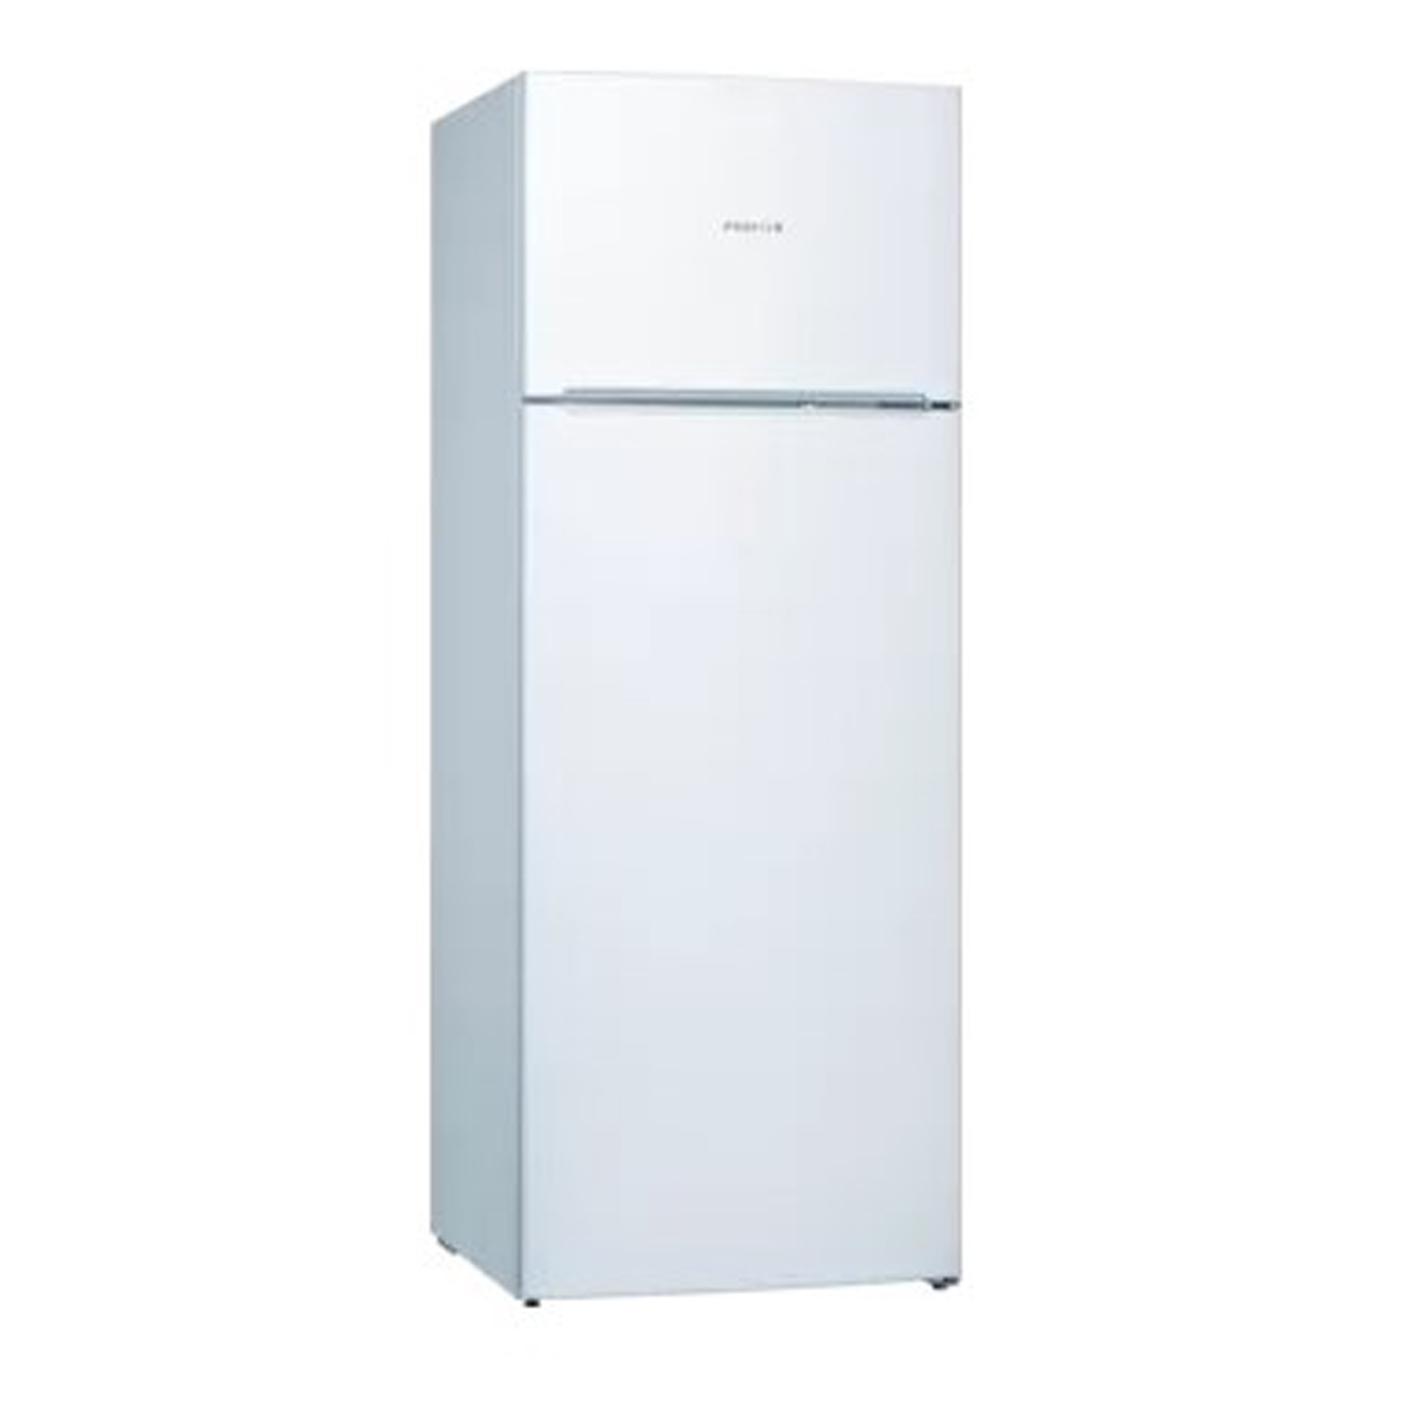 Profilo BD2156W2VN No-Frost Buzdolabı Comfort Serisi